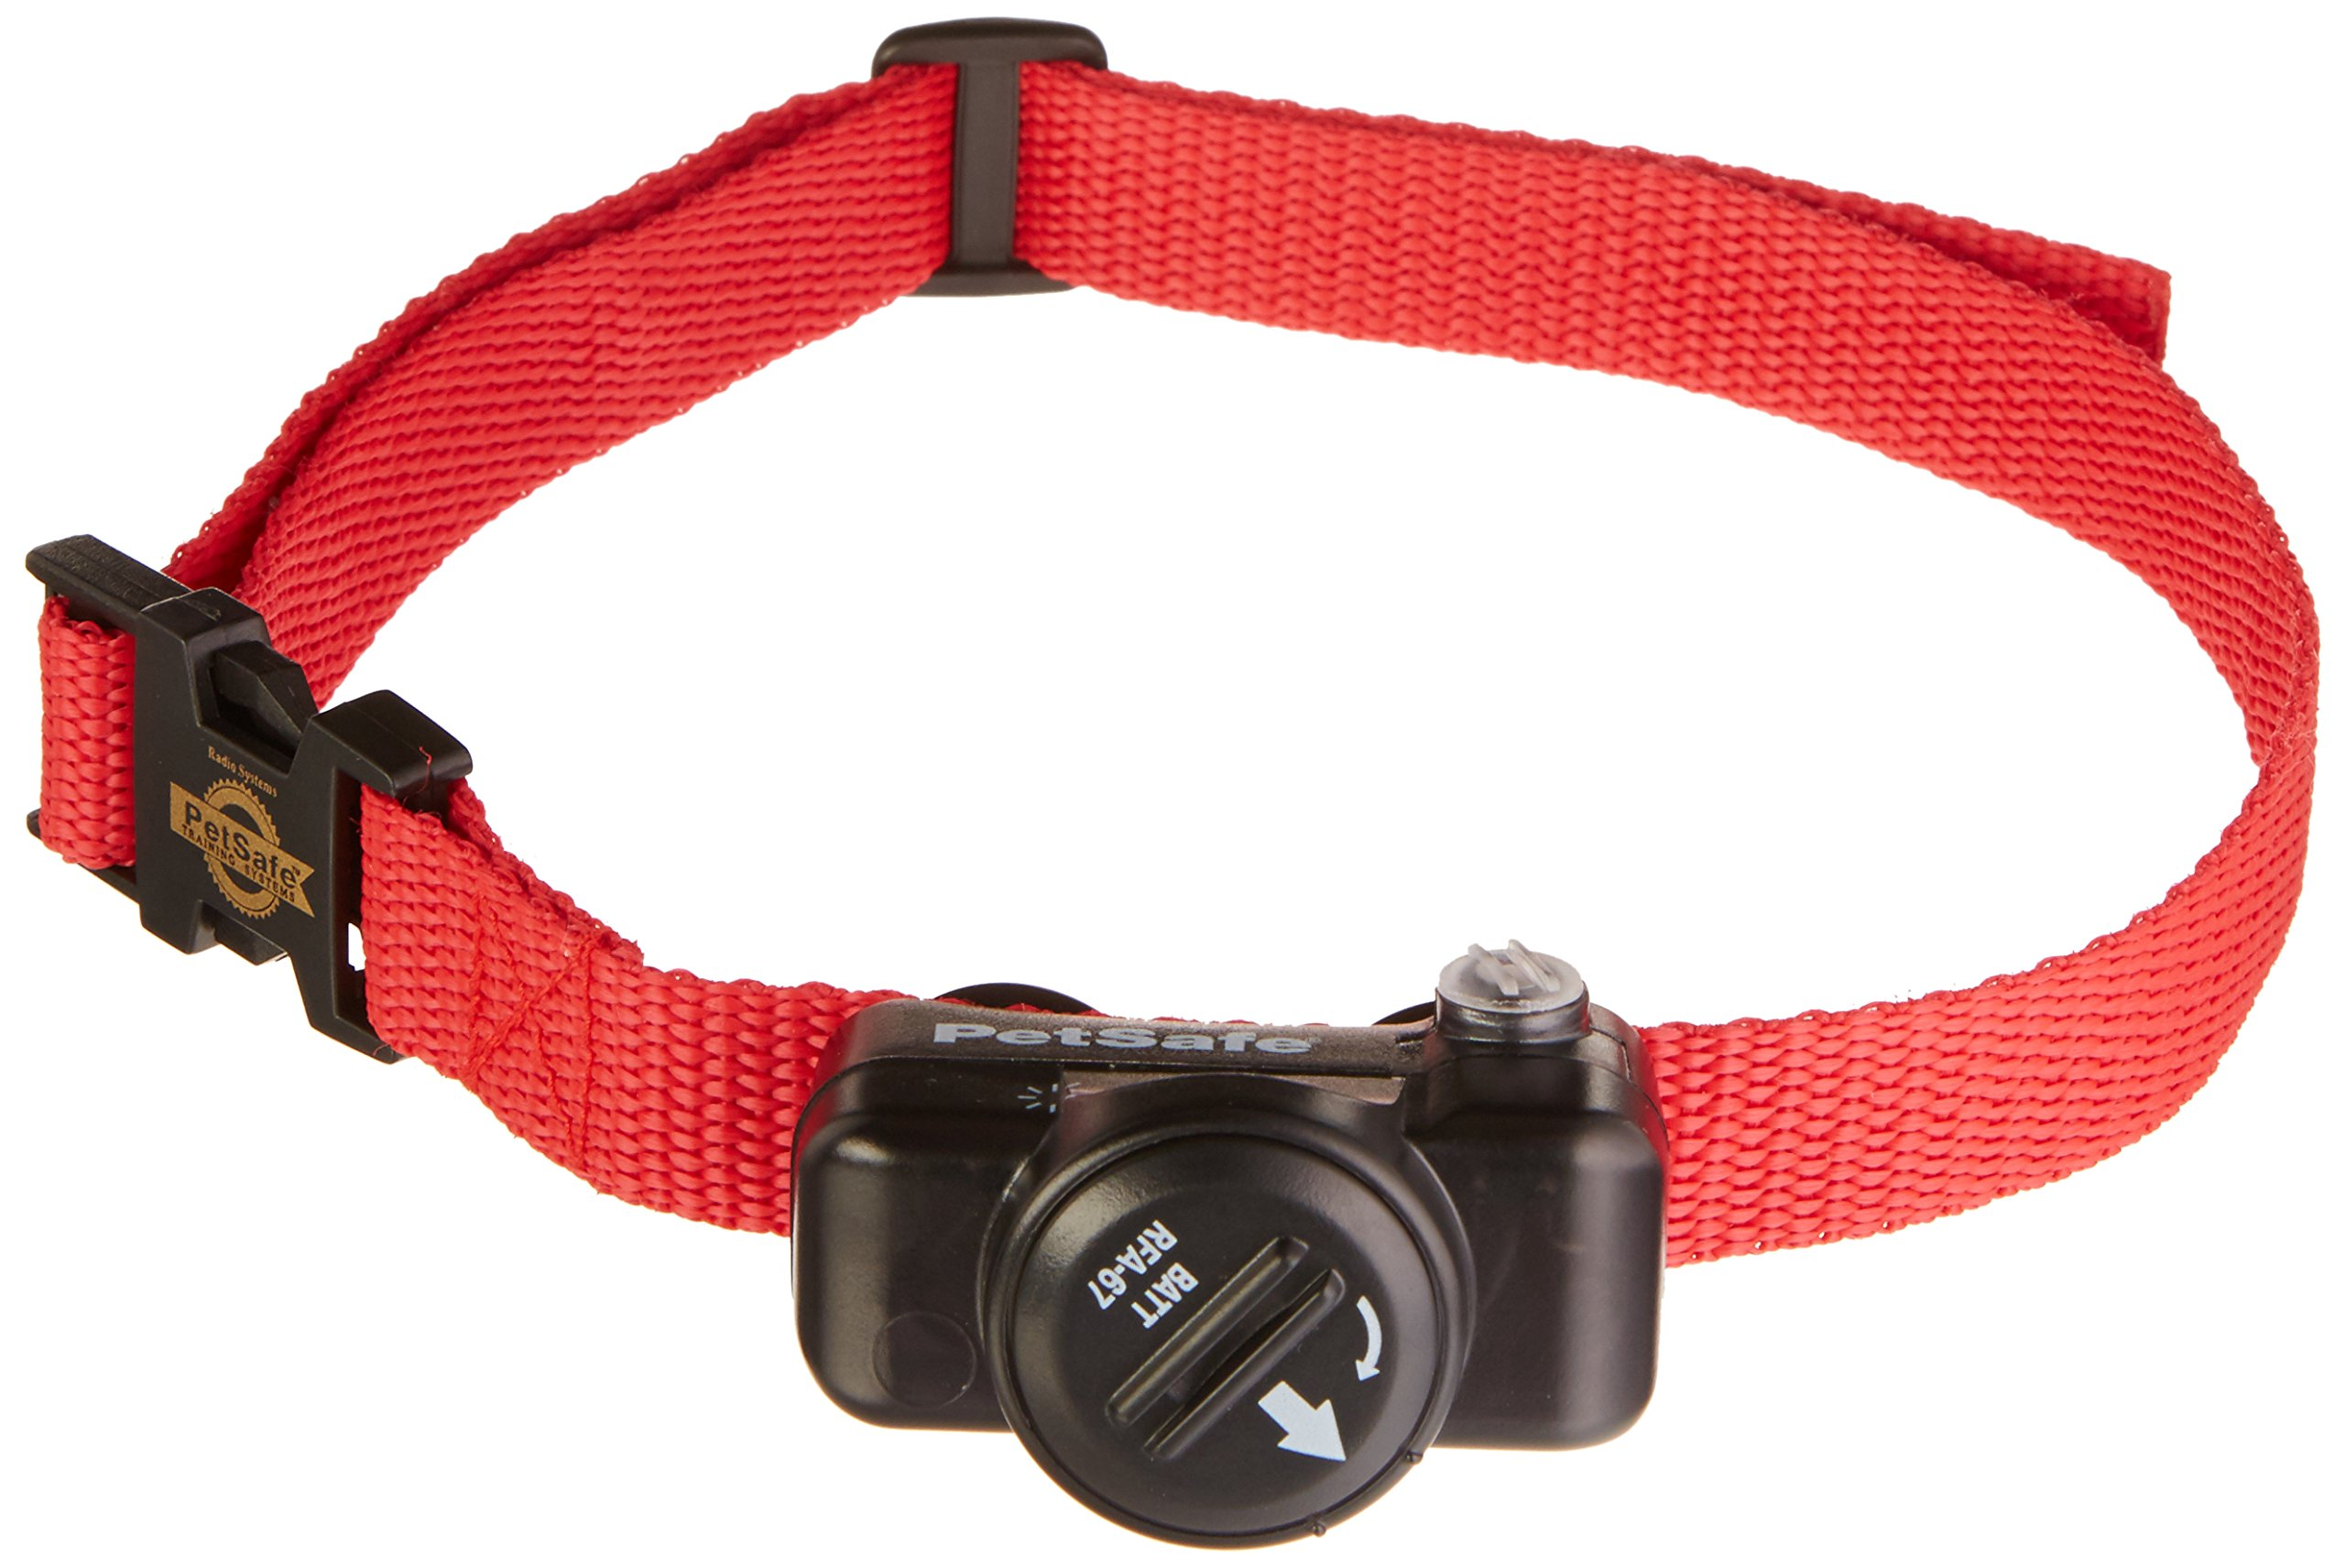 PetSafe UL-275-67D, Dogs, In-Ground Deluxe Ultralight Collar by PetSafe